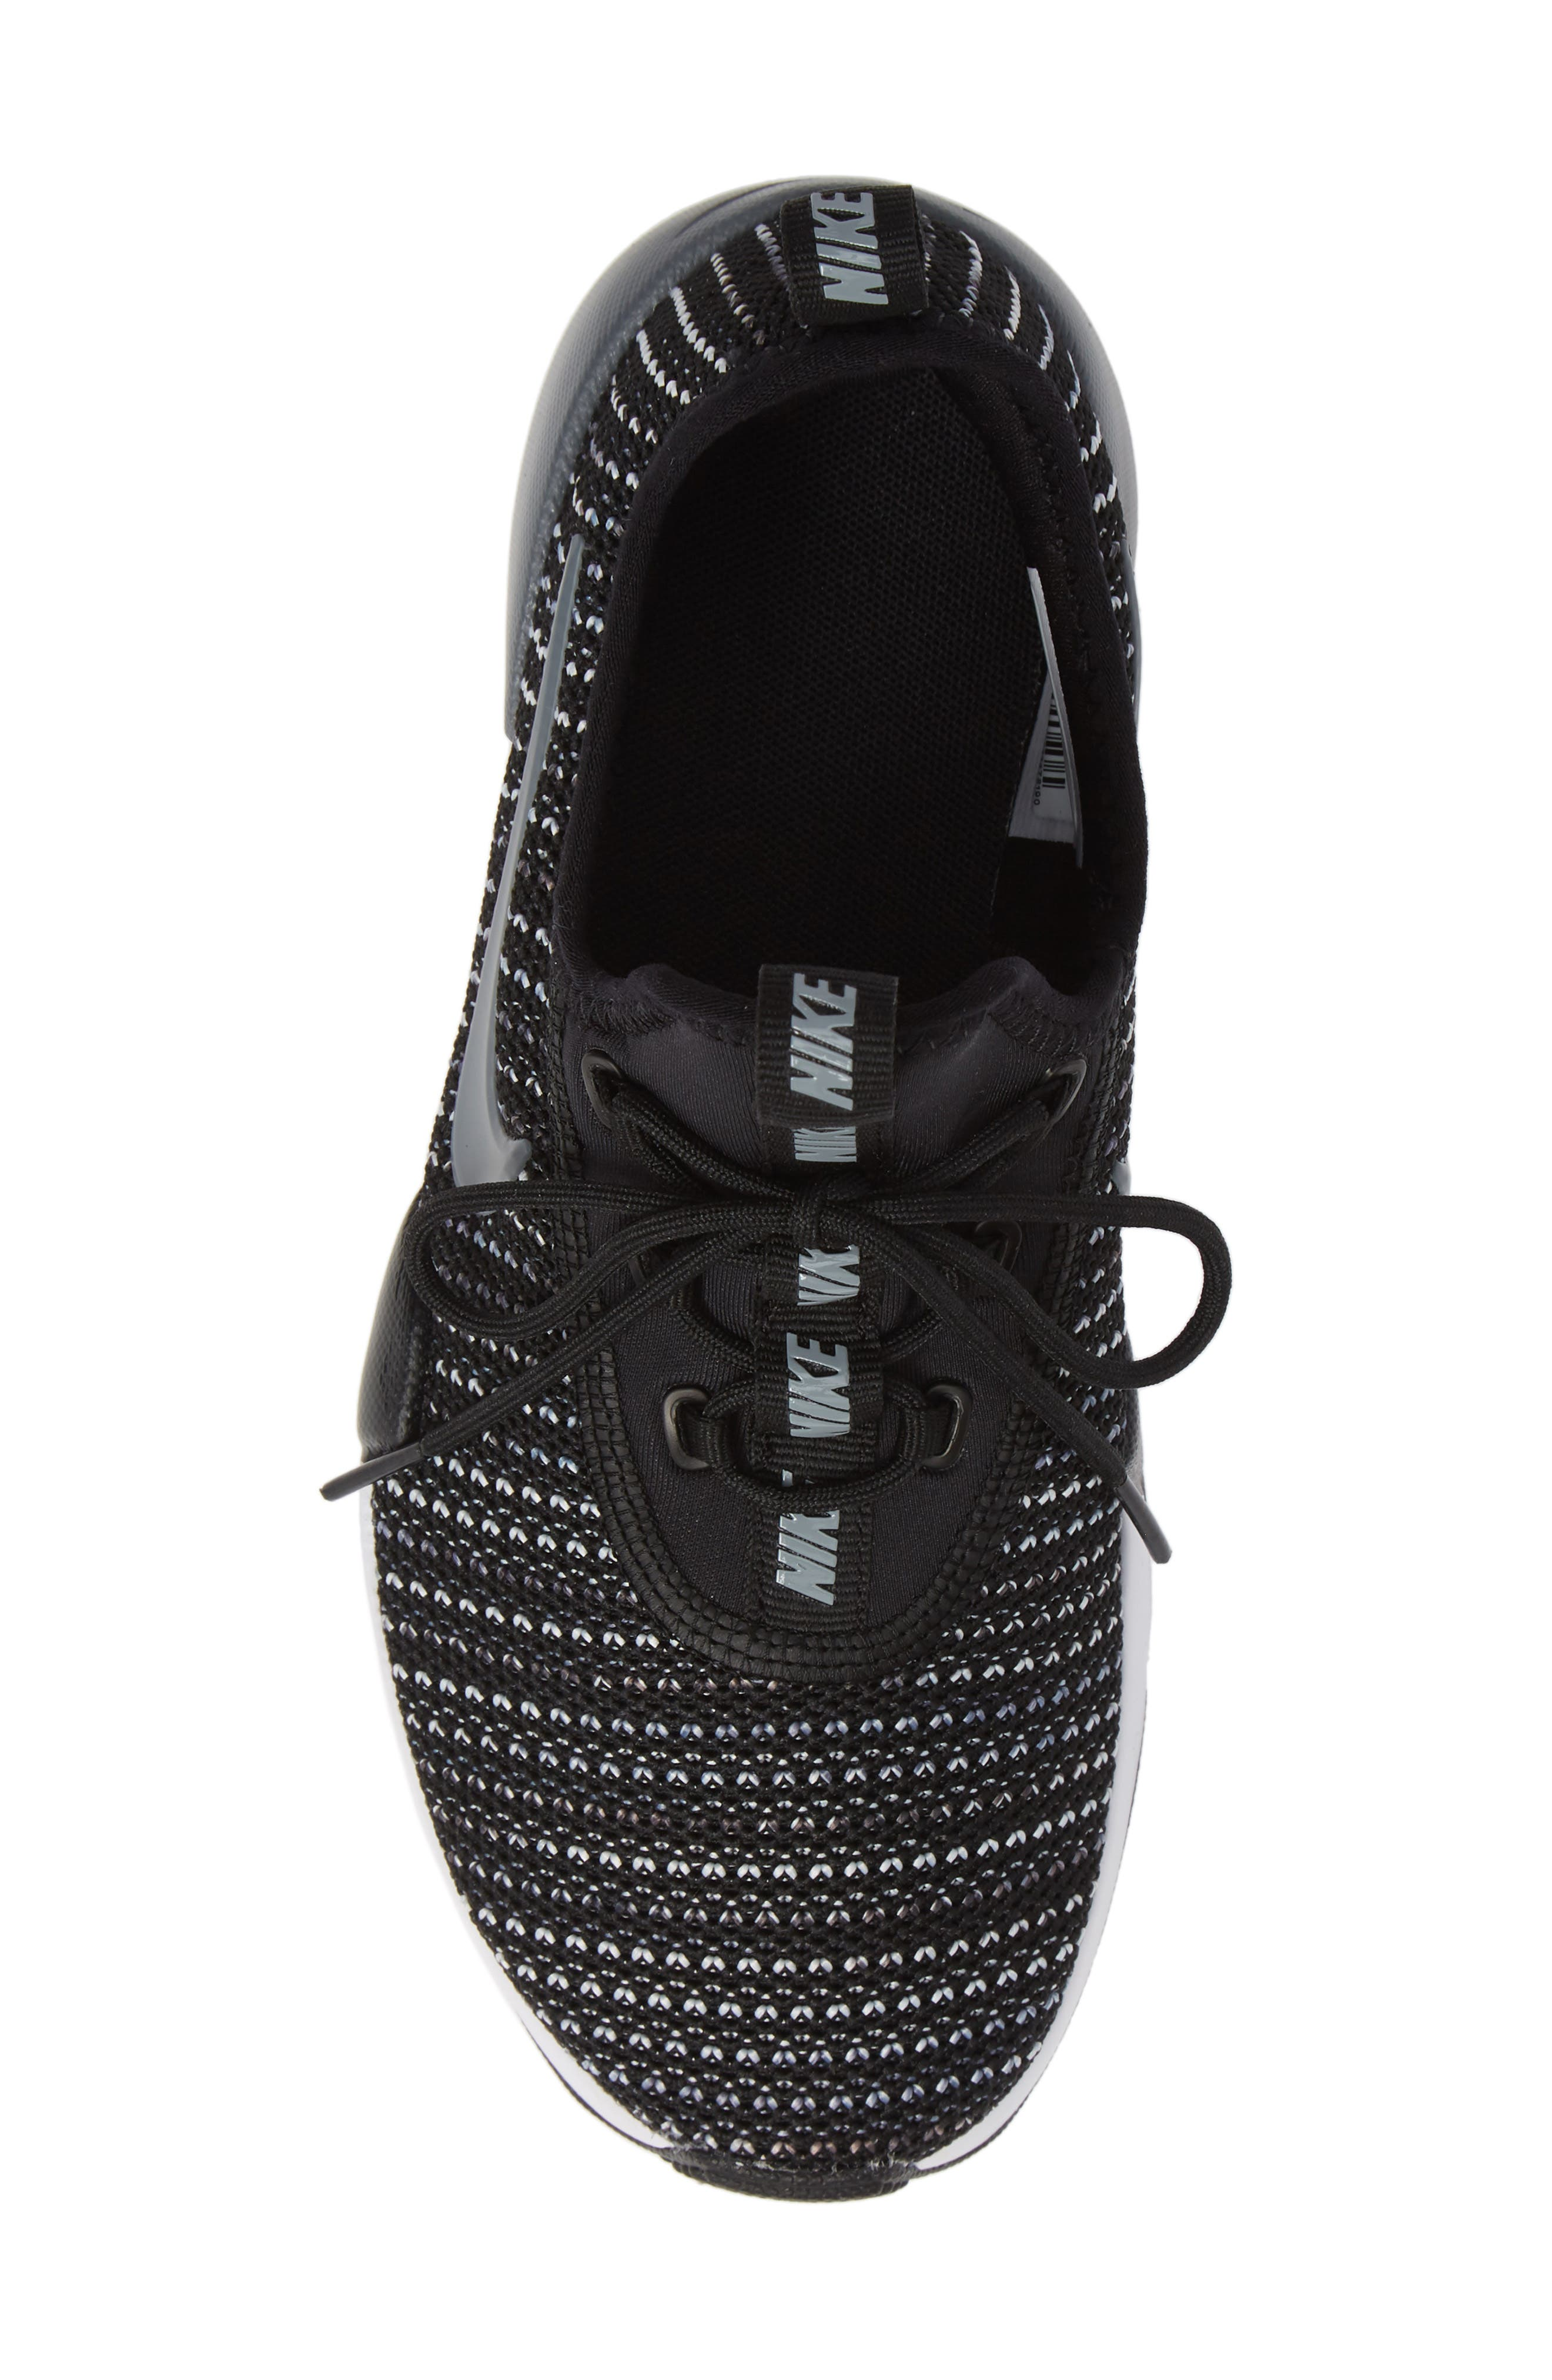 Ashin Modern Sock Knit Sneaker,                             Alternate thumbnail 3, color,                             Black/ Cool Grey/ Anthracite